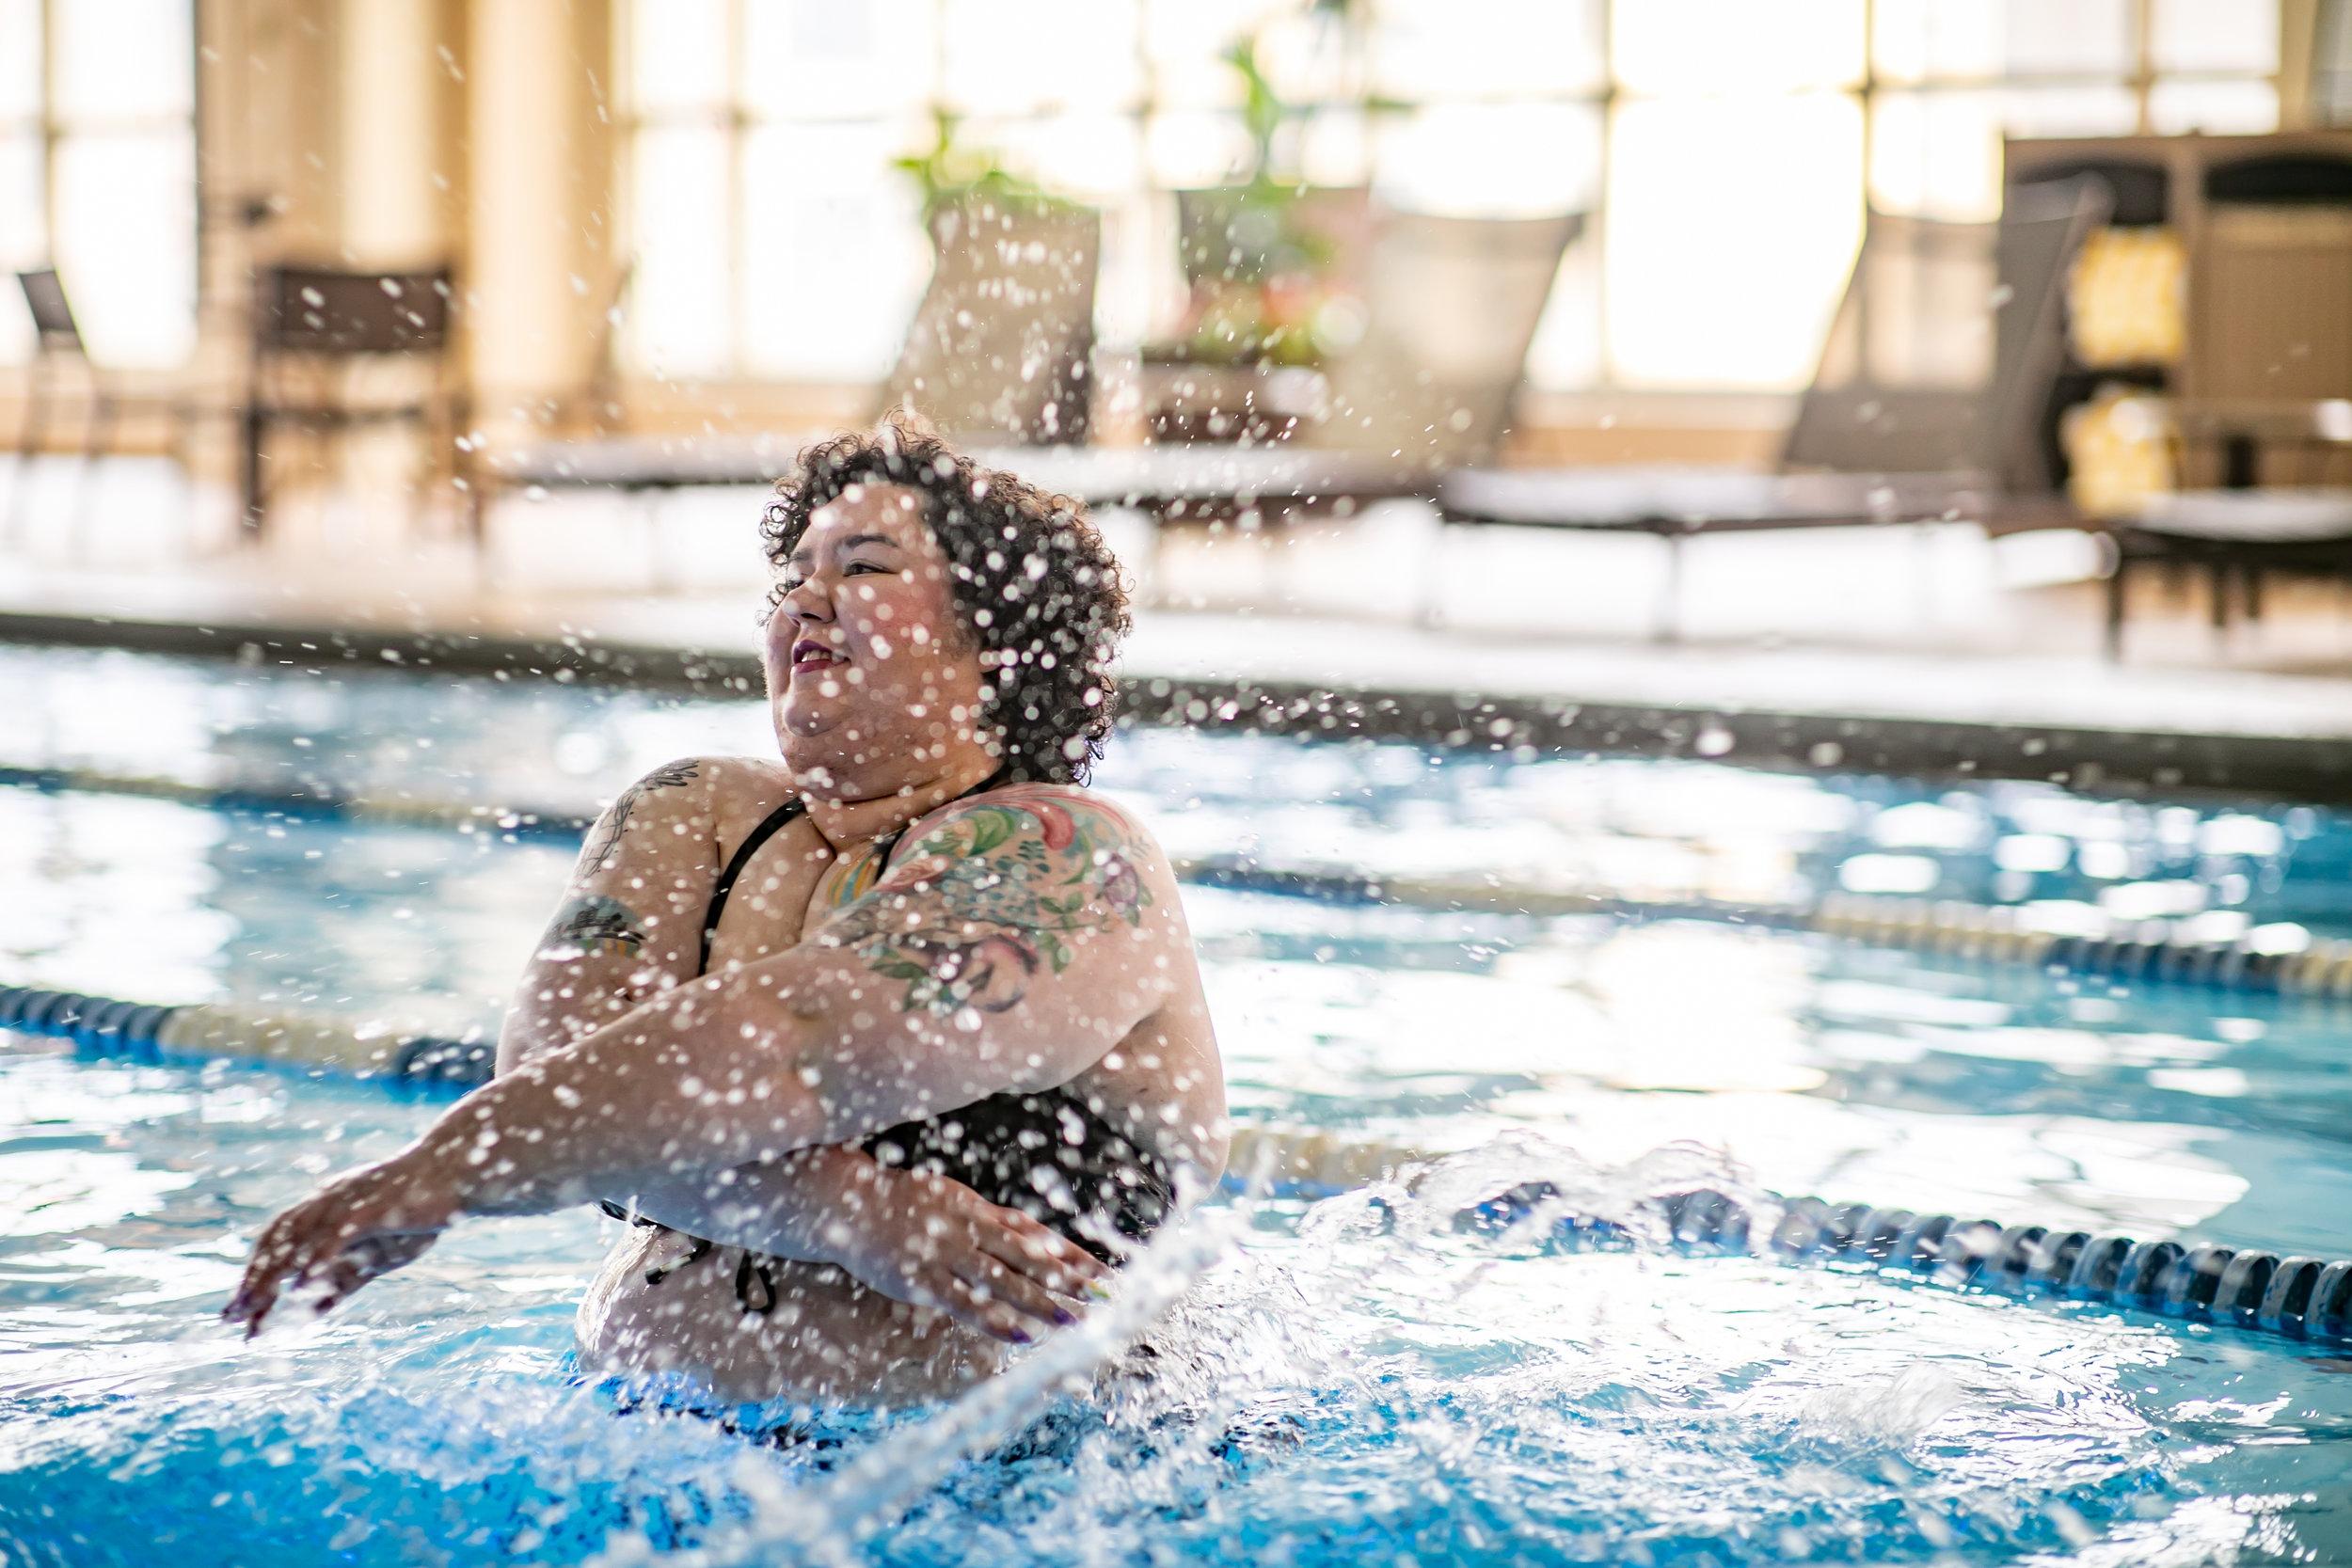 chicago lake county blogger influencer mechanic shop femme hilton hotel swimsuit-5939.jpg